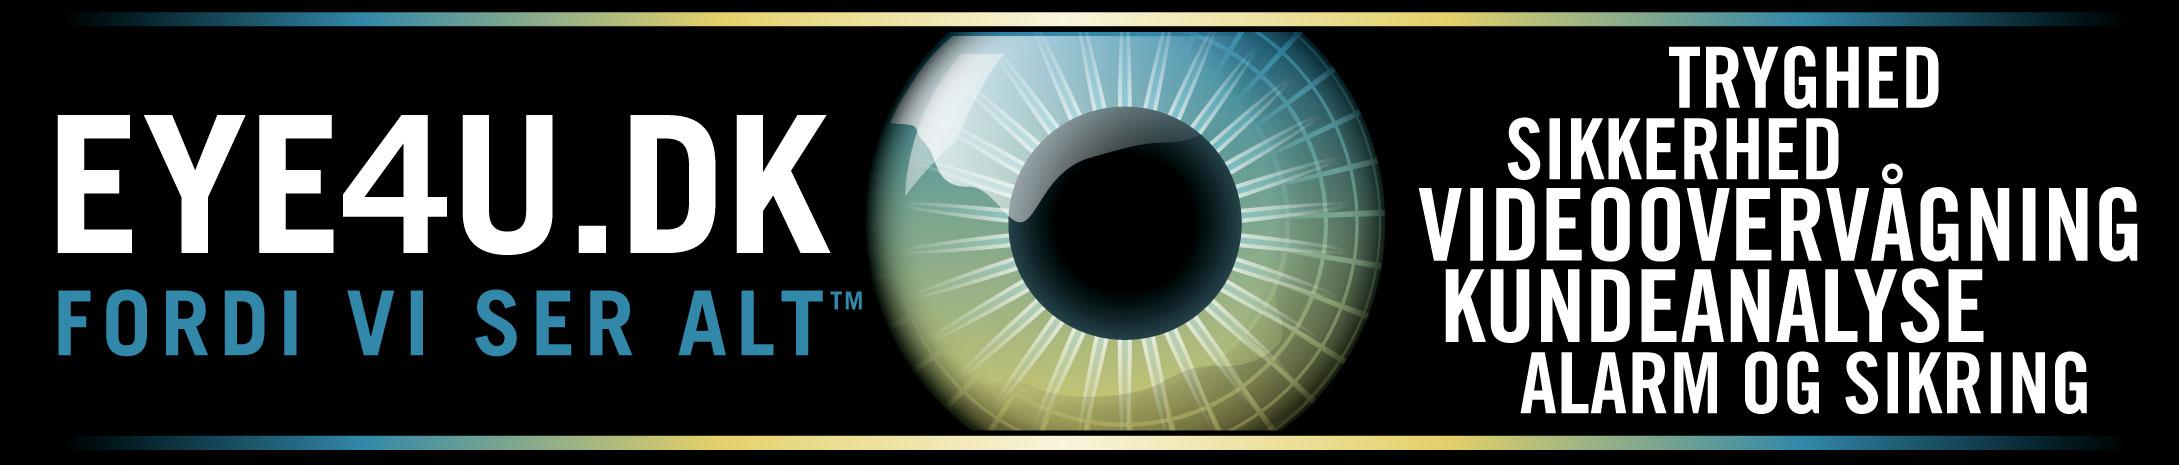 eye4U-DK_logoBlueYellow_080615_rgb.jpg